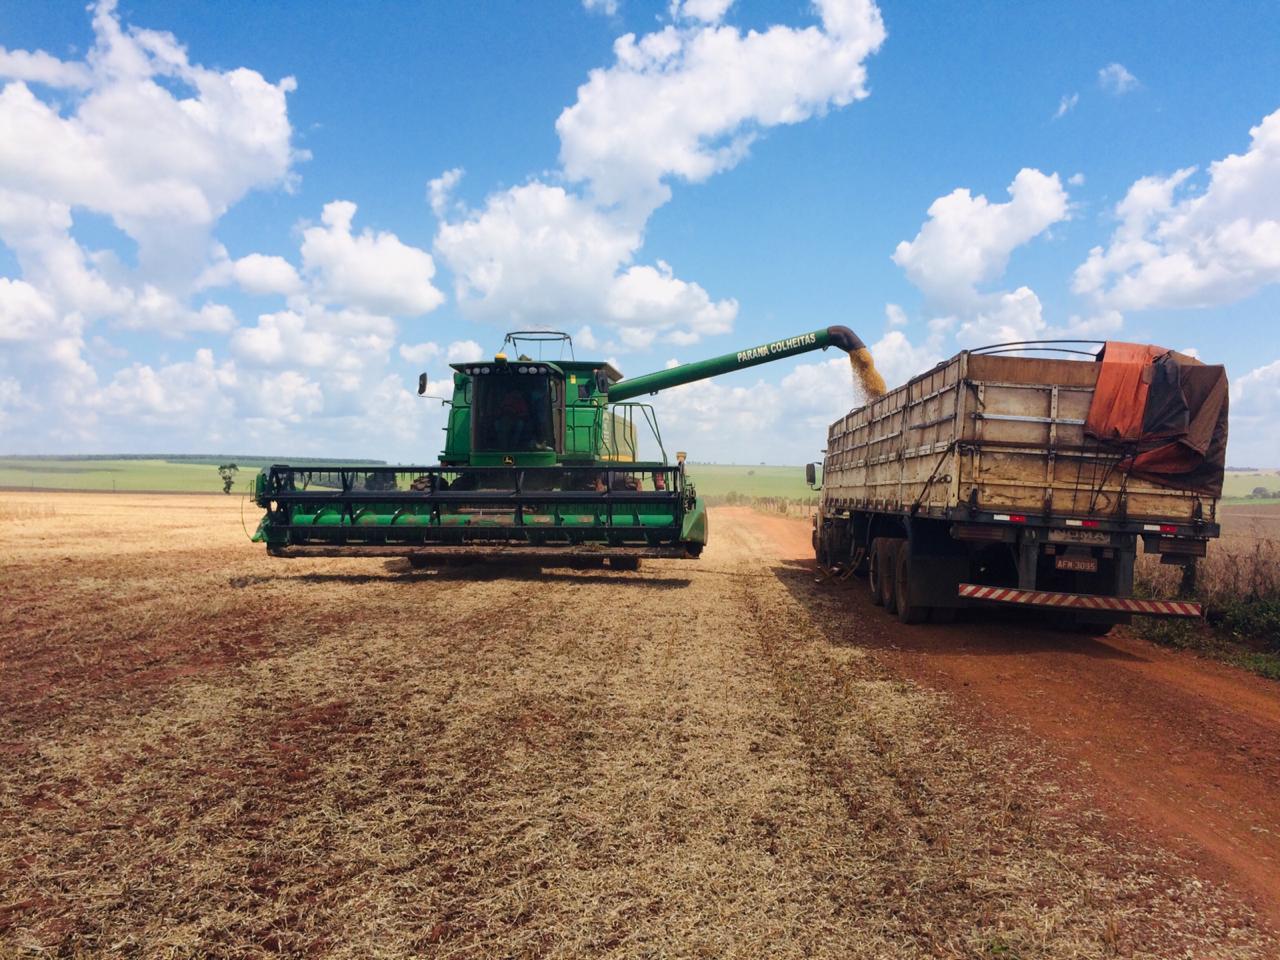 Colheita de soja em Rio Verde (GO). Envio de Alex Zamonaro